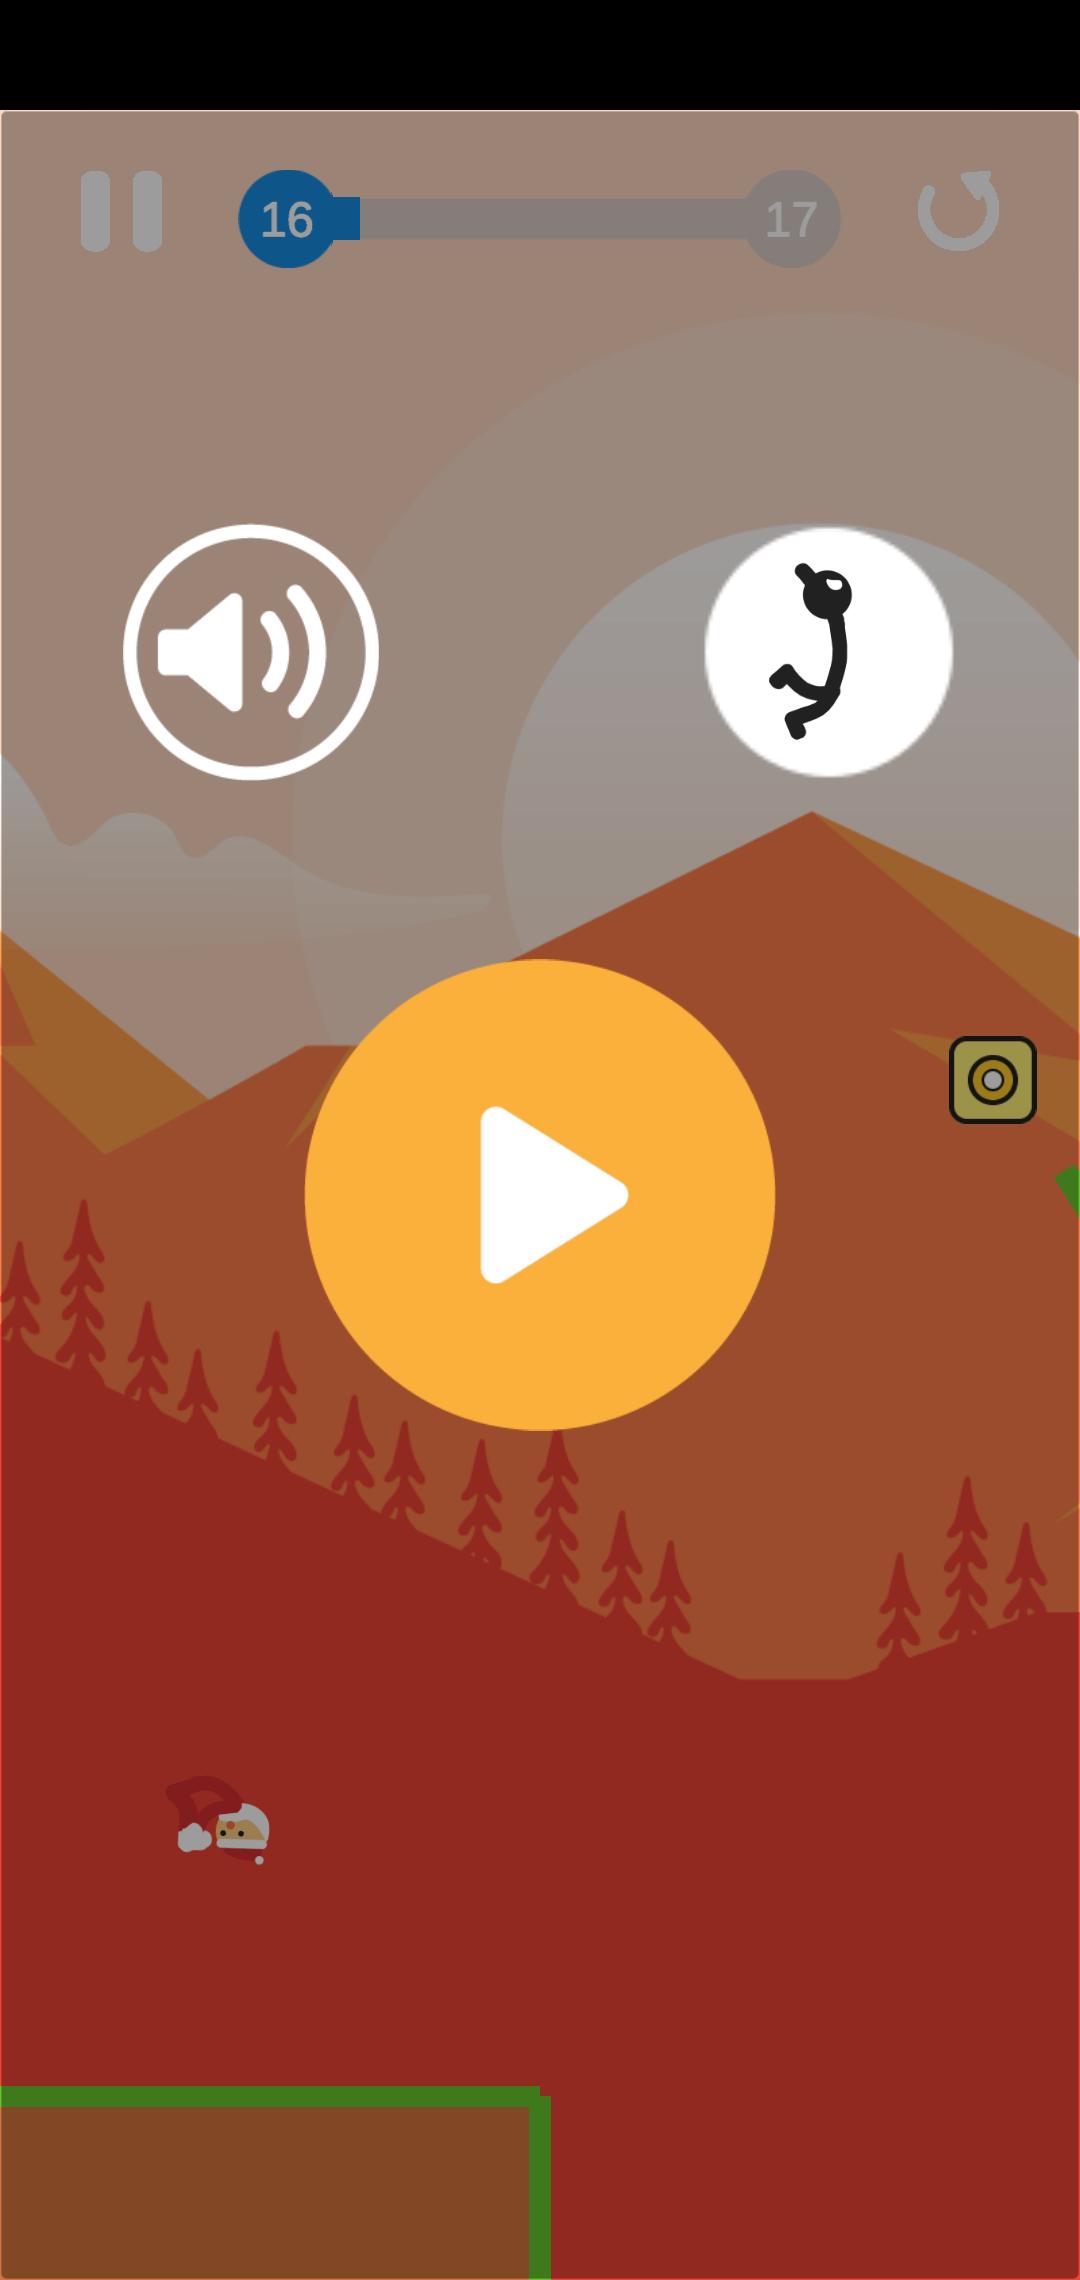 Swing Star (Top Free Game)